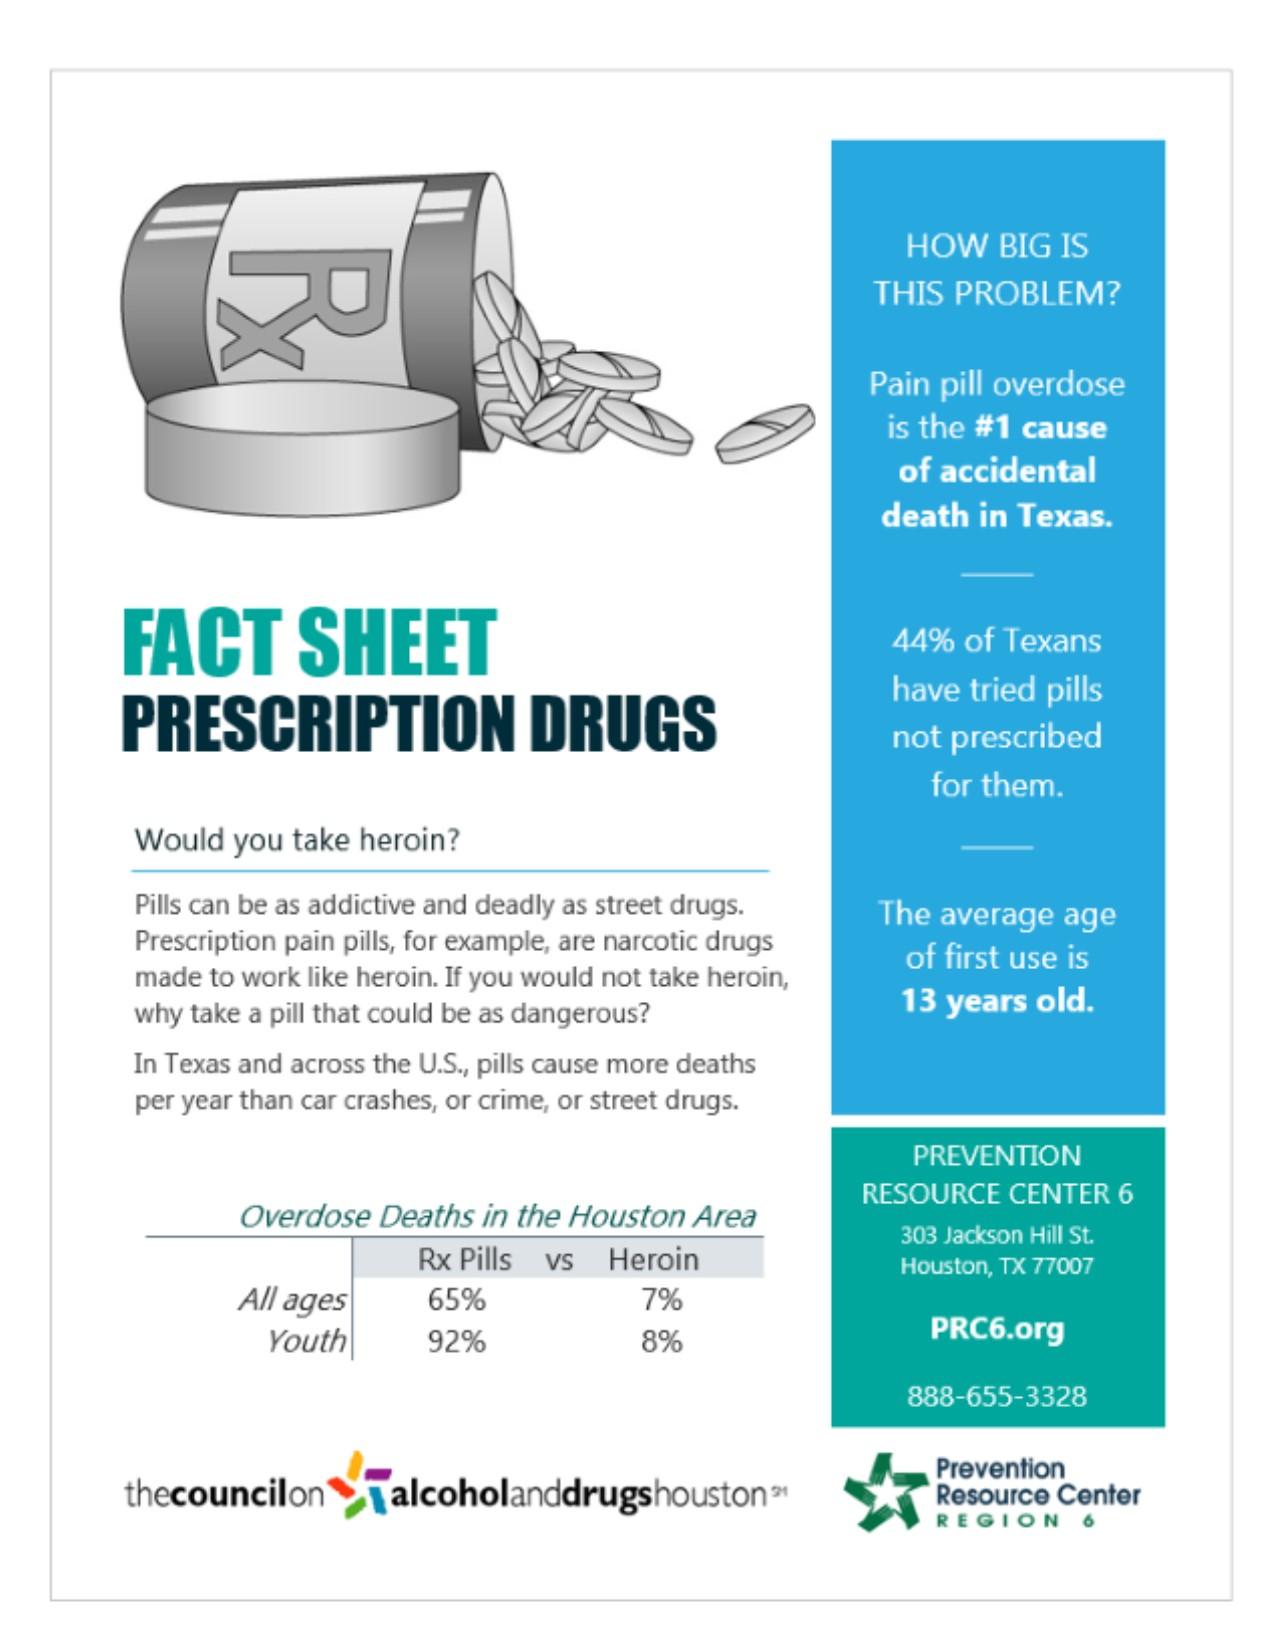 FactSheet_RxDrugs_20141021